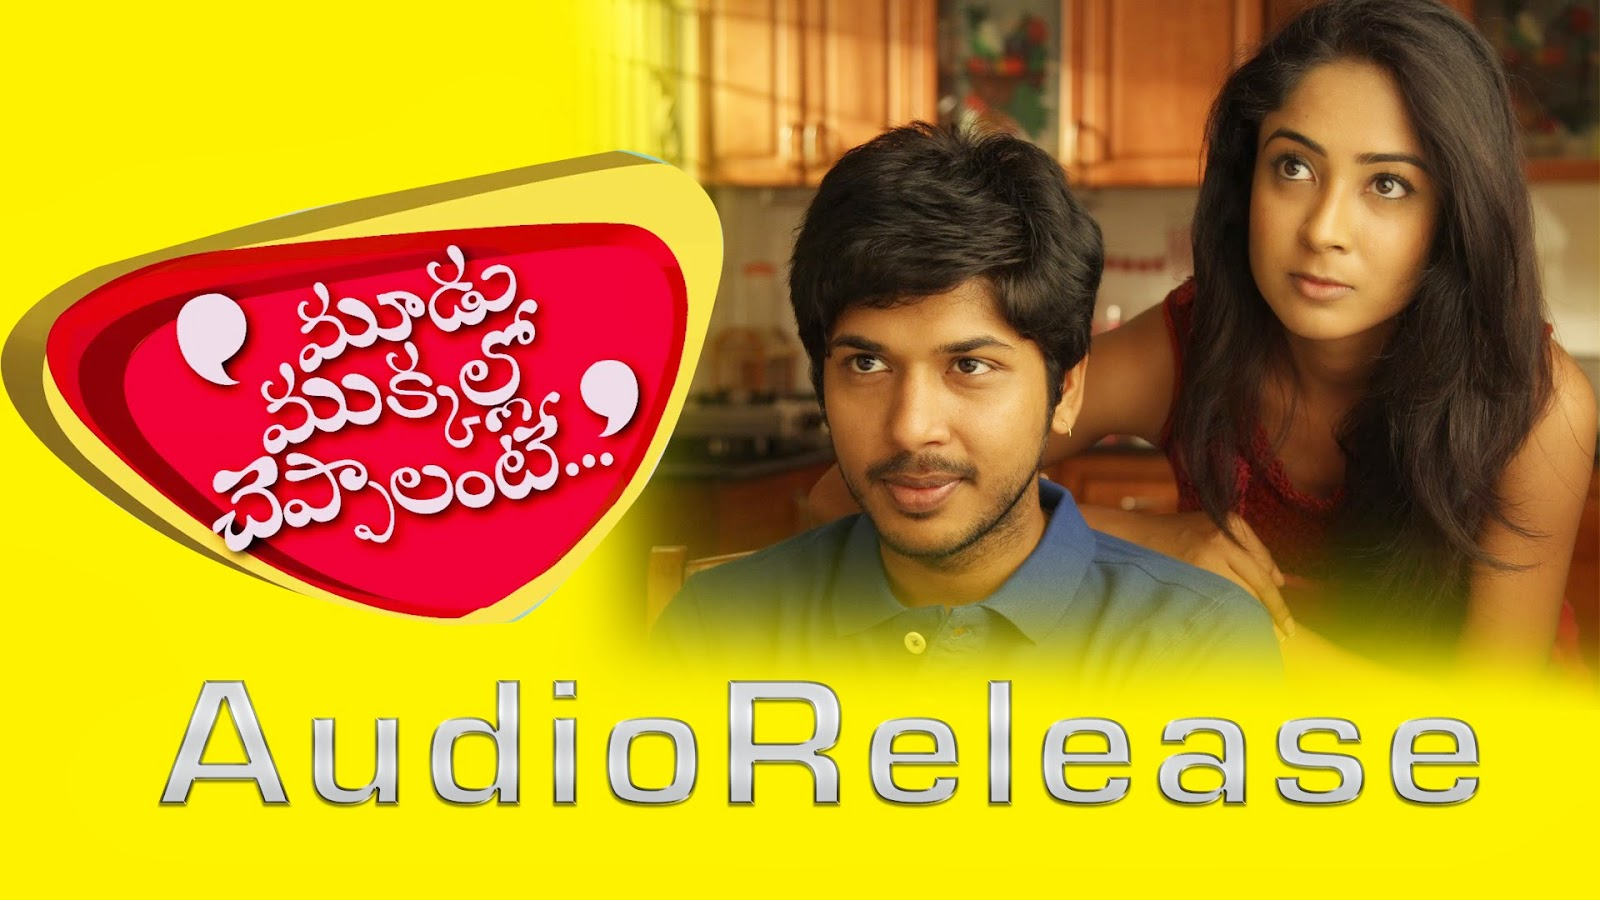 Moodu Mukkallo Cheppalante Telugu songs